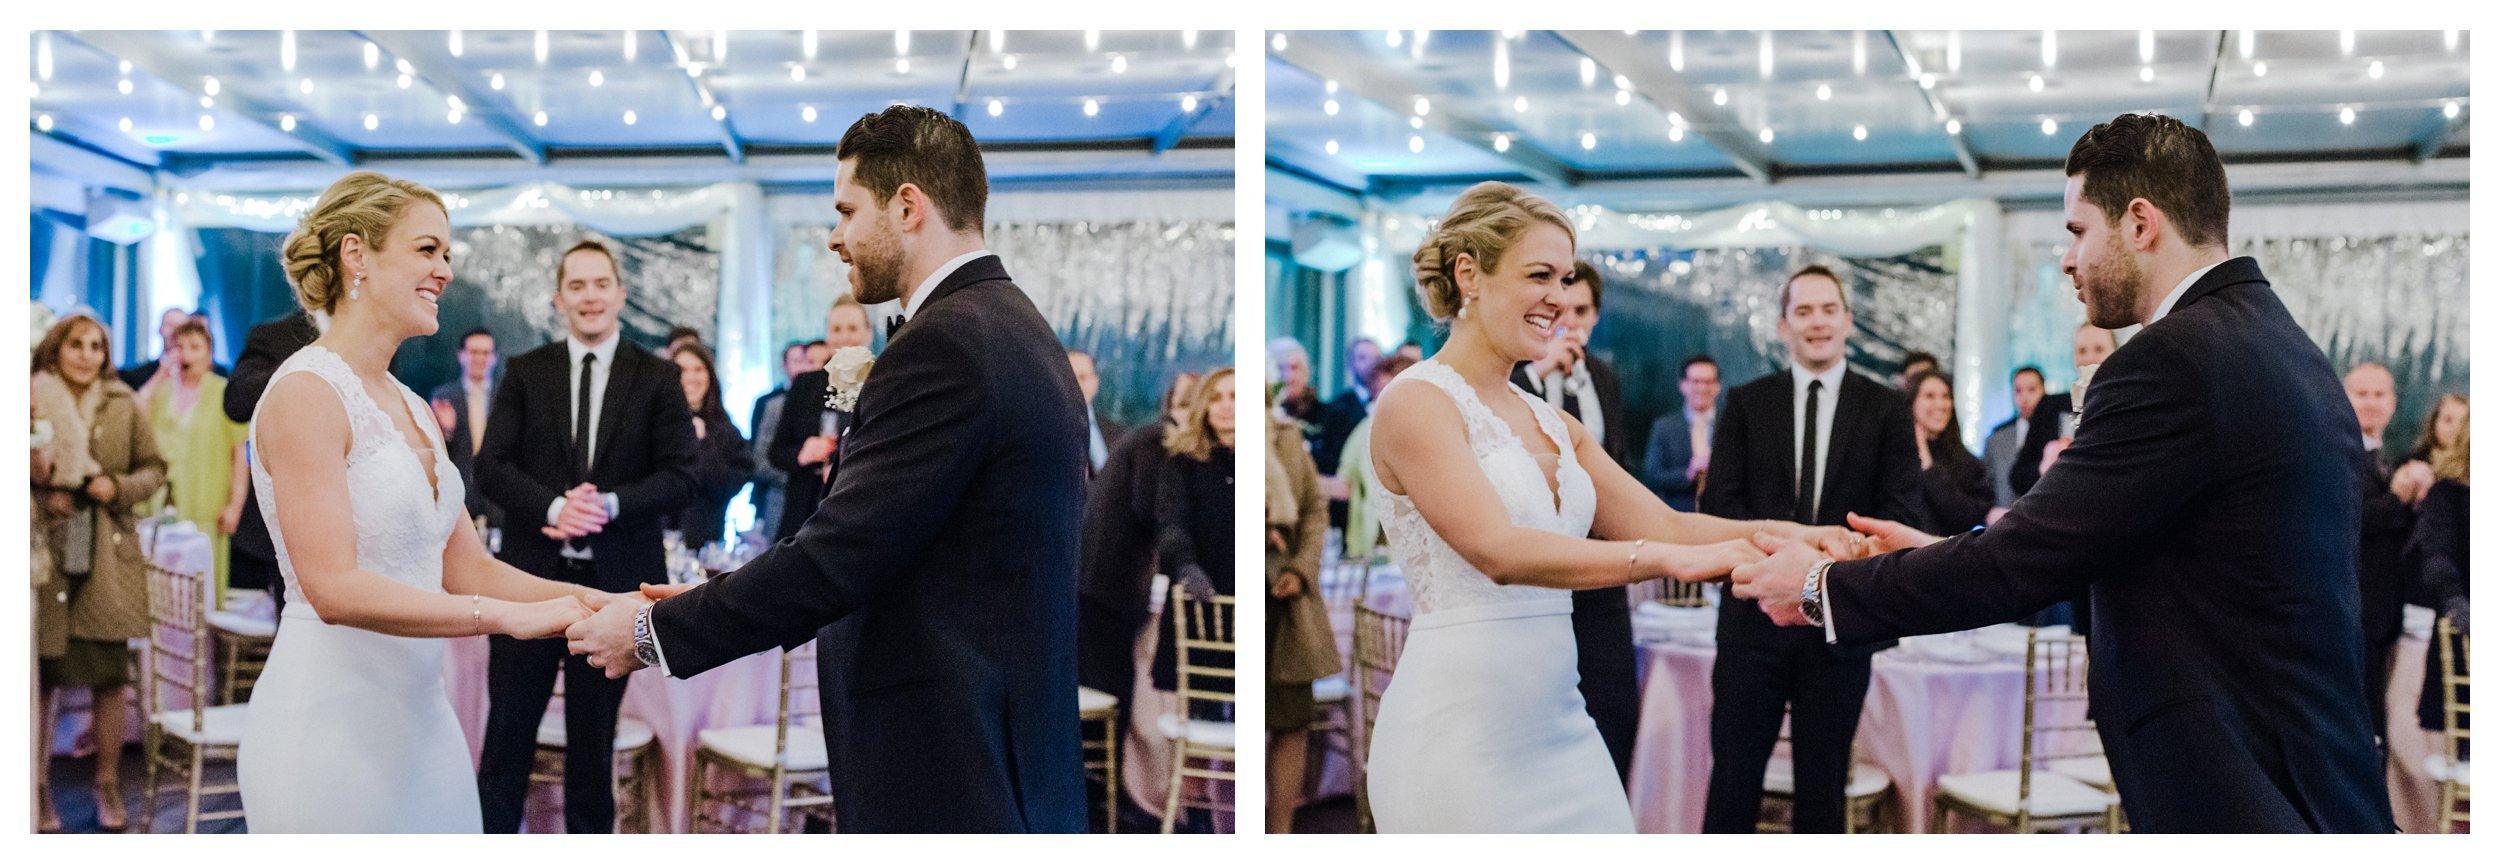 washington-dc-wedding-photographer-46.JPG